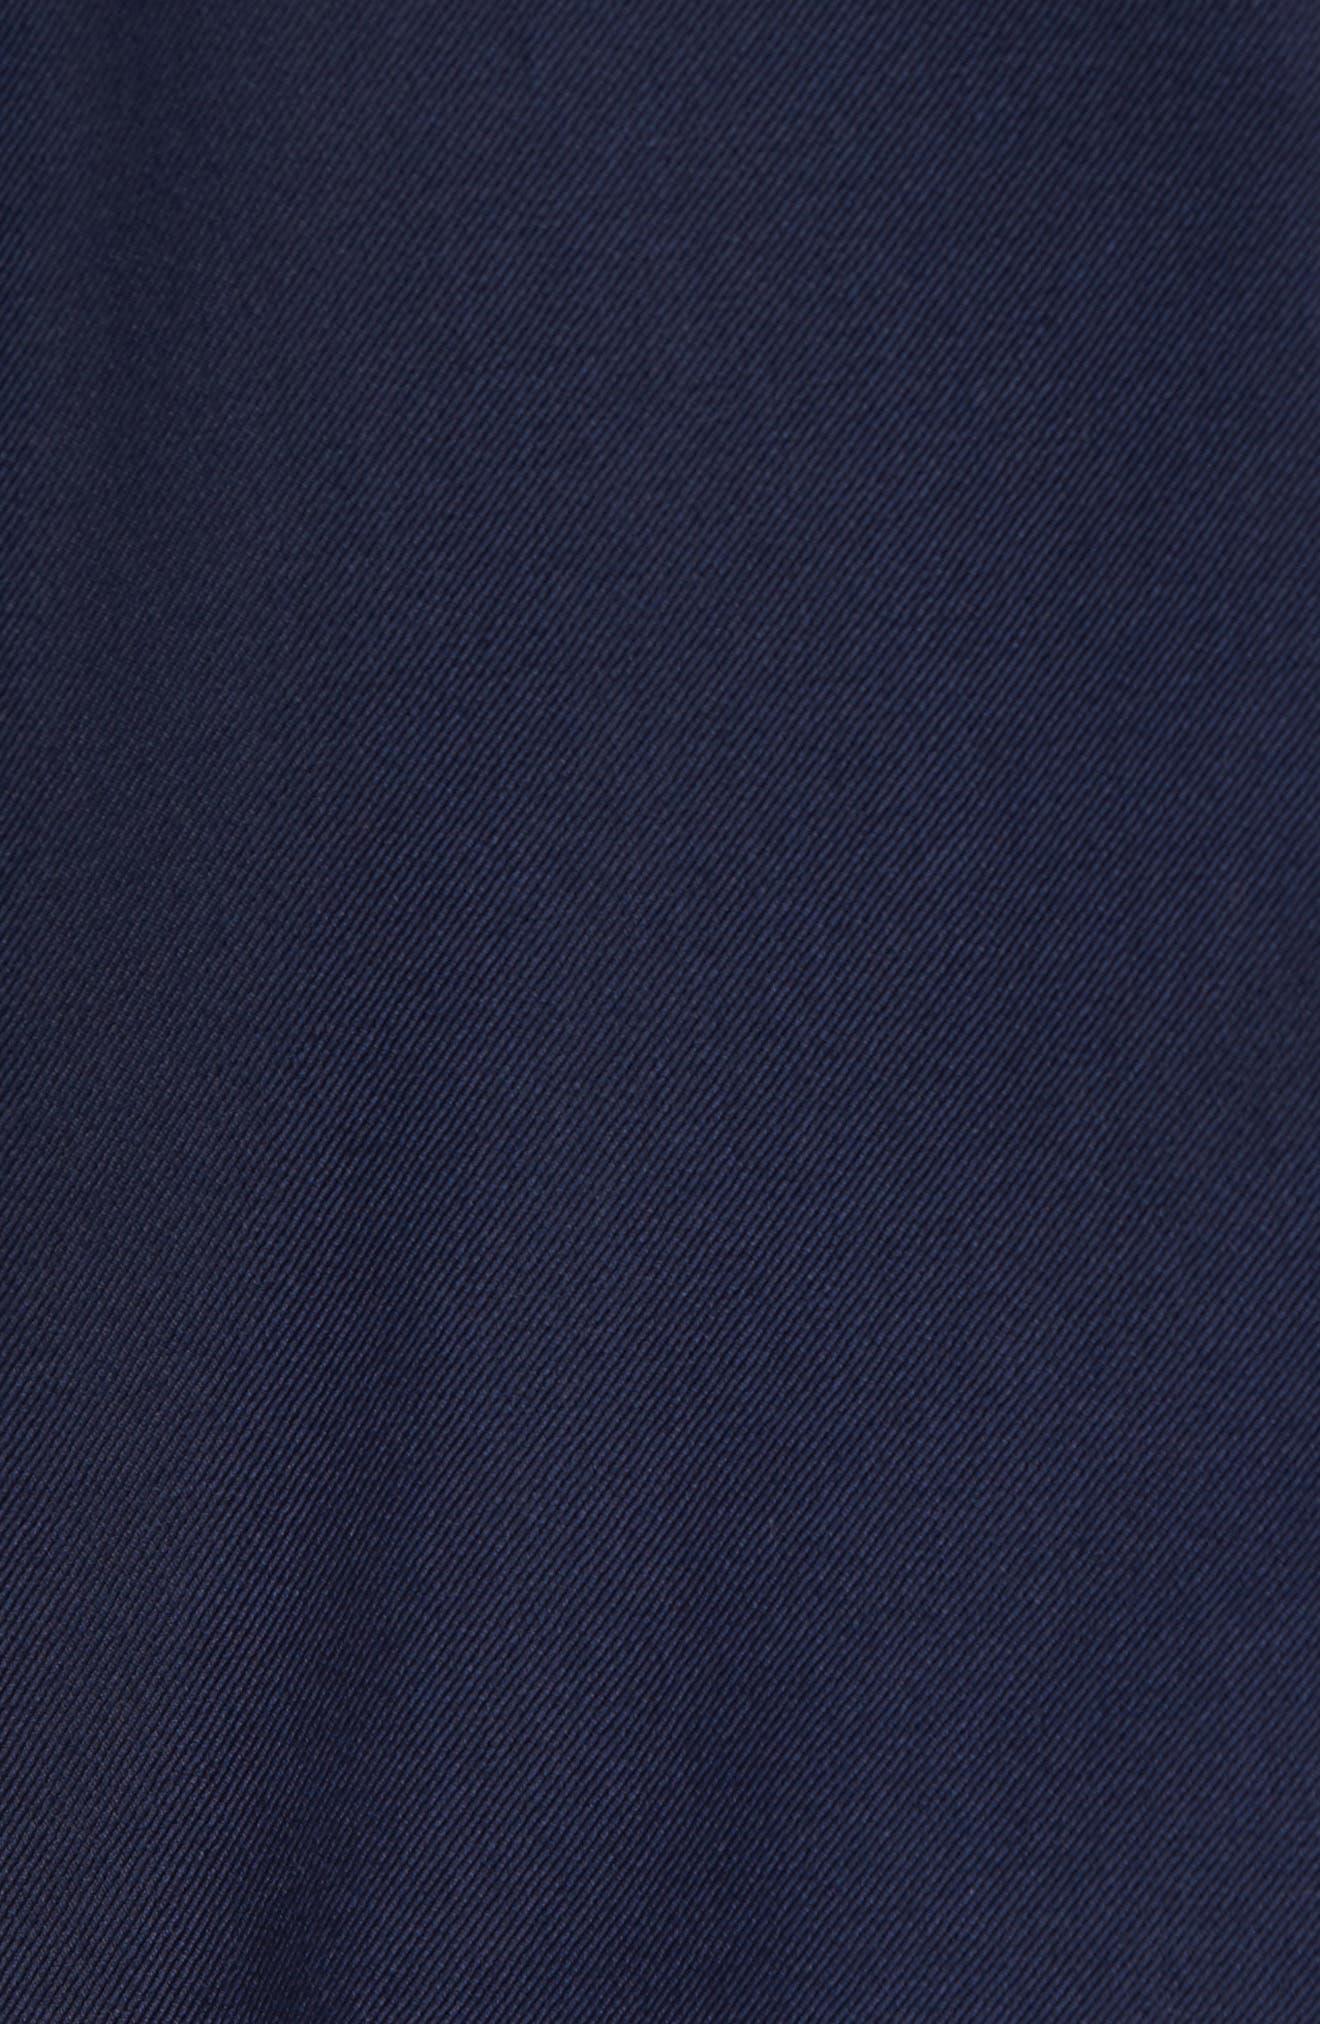 Classic B Fit Loro Piana Wool Suit,                             Alternate thumbnail 7, color,                             Navy